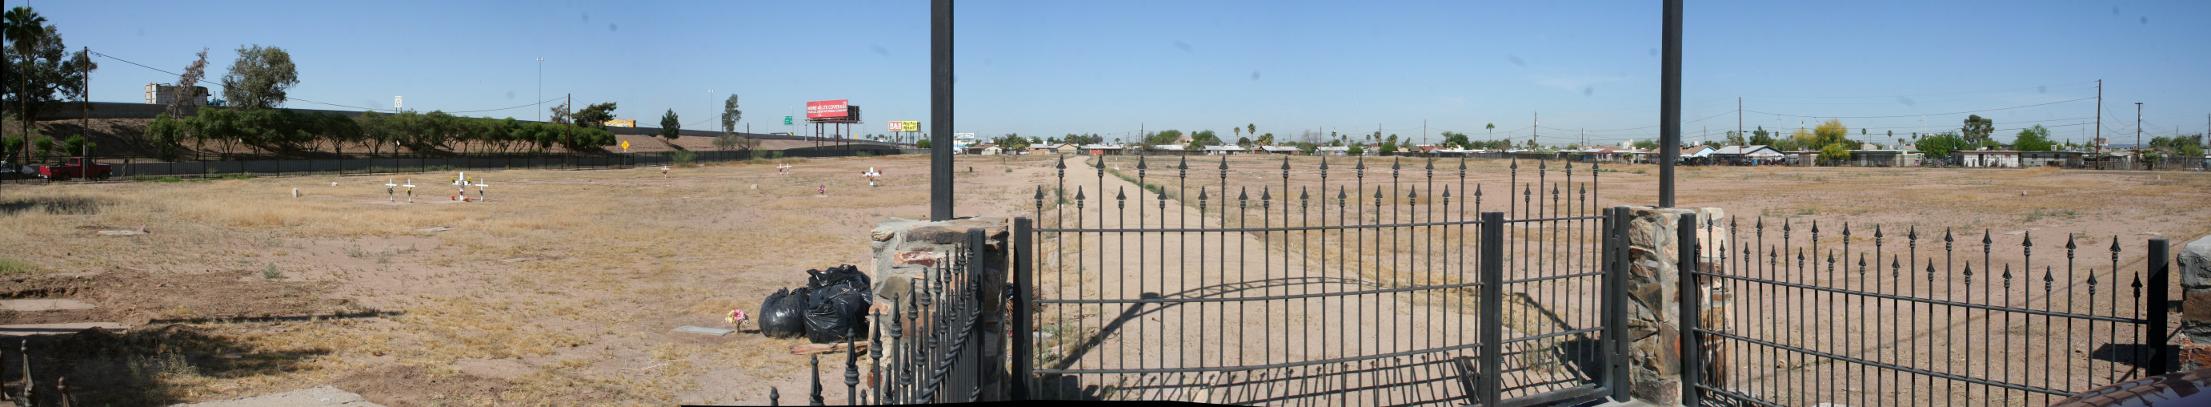 Cementerio Lindo